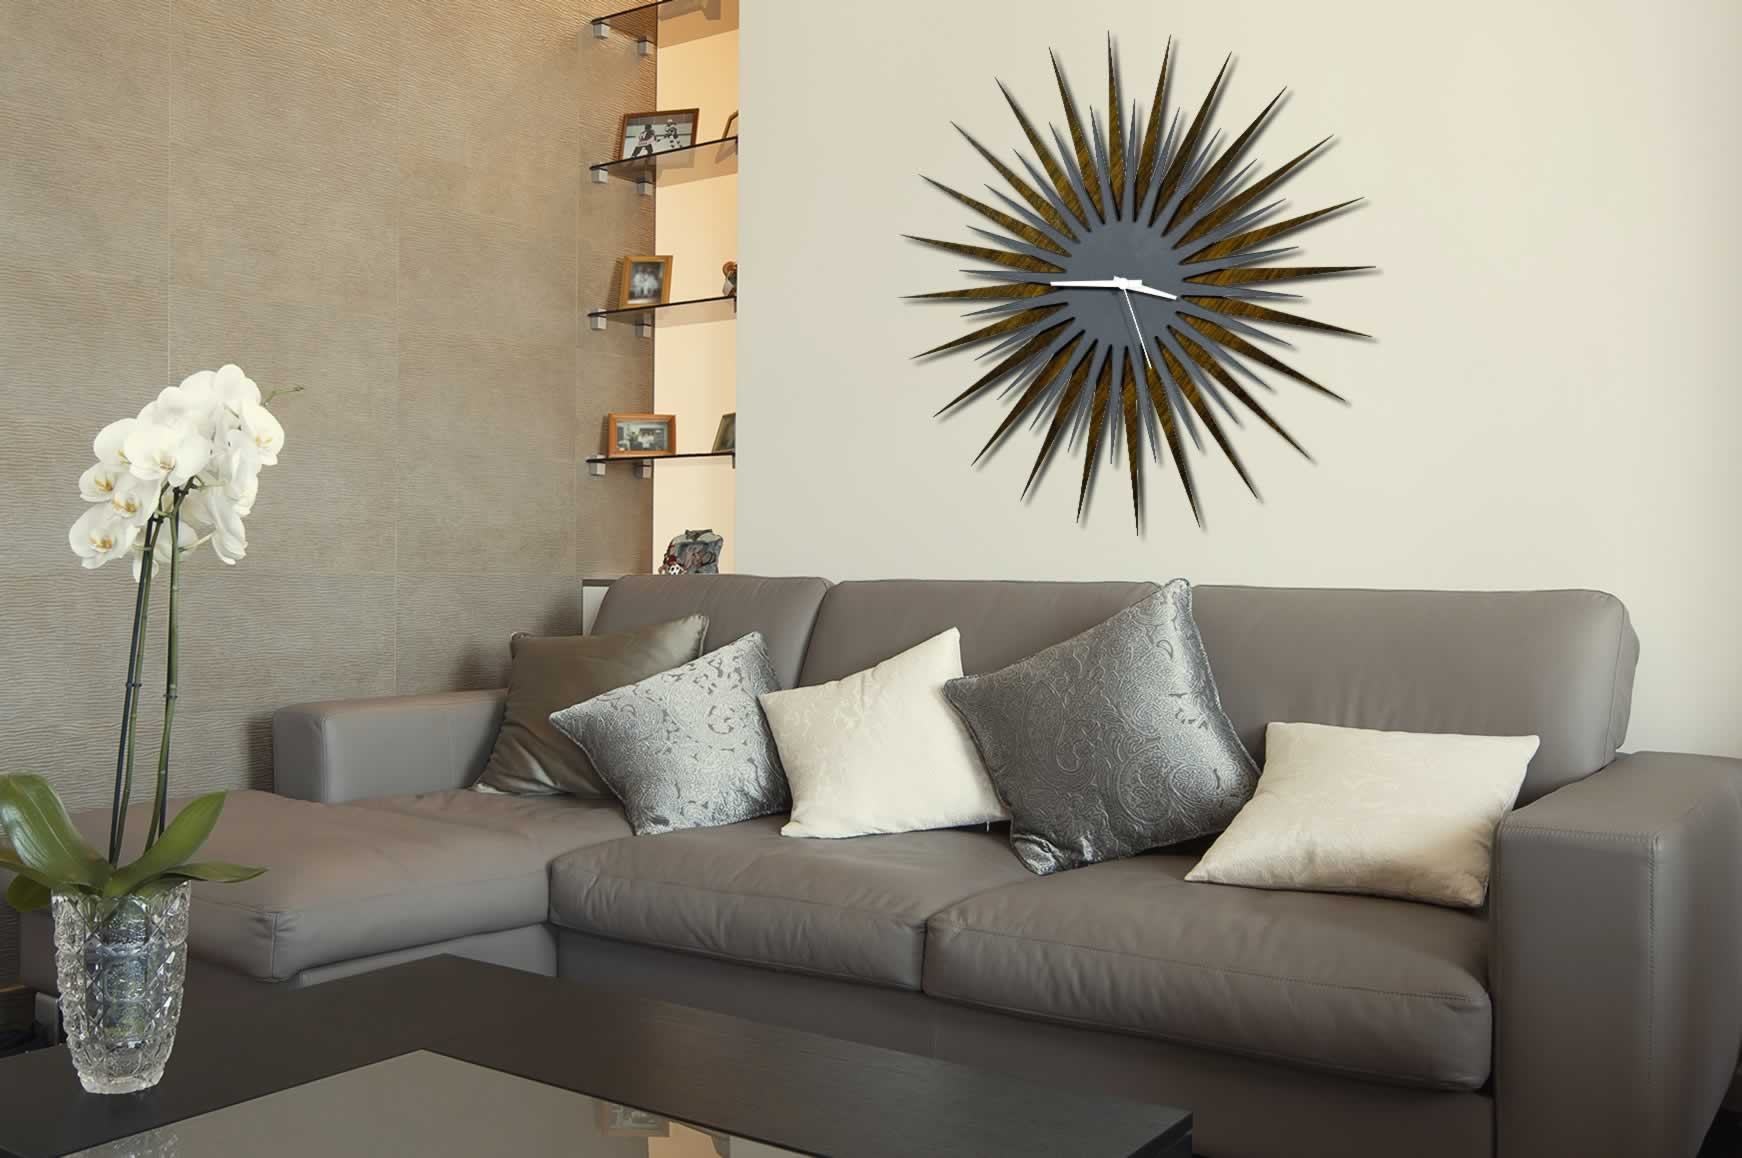 RF Atomic Clock - Walnut Grey/White Starburst - Lifestyle Image